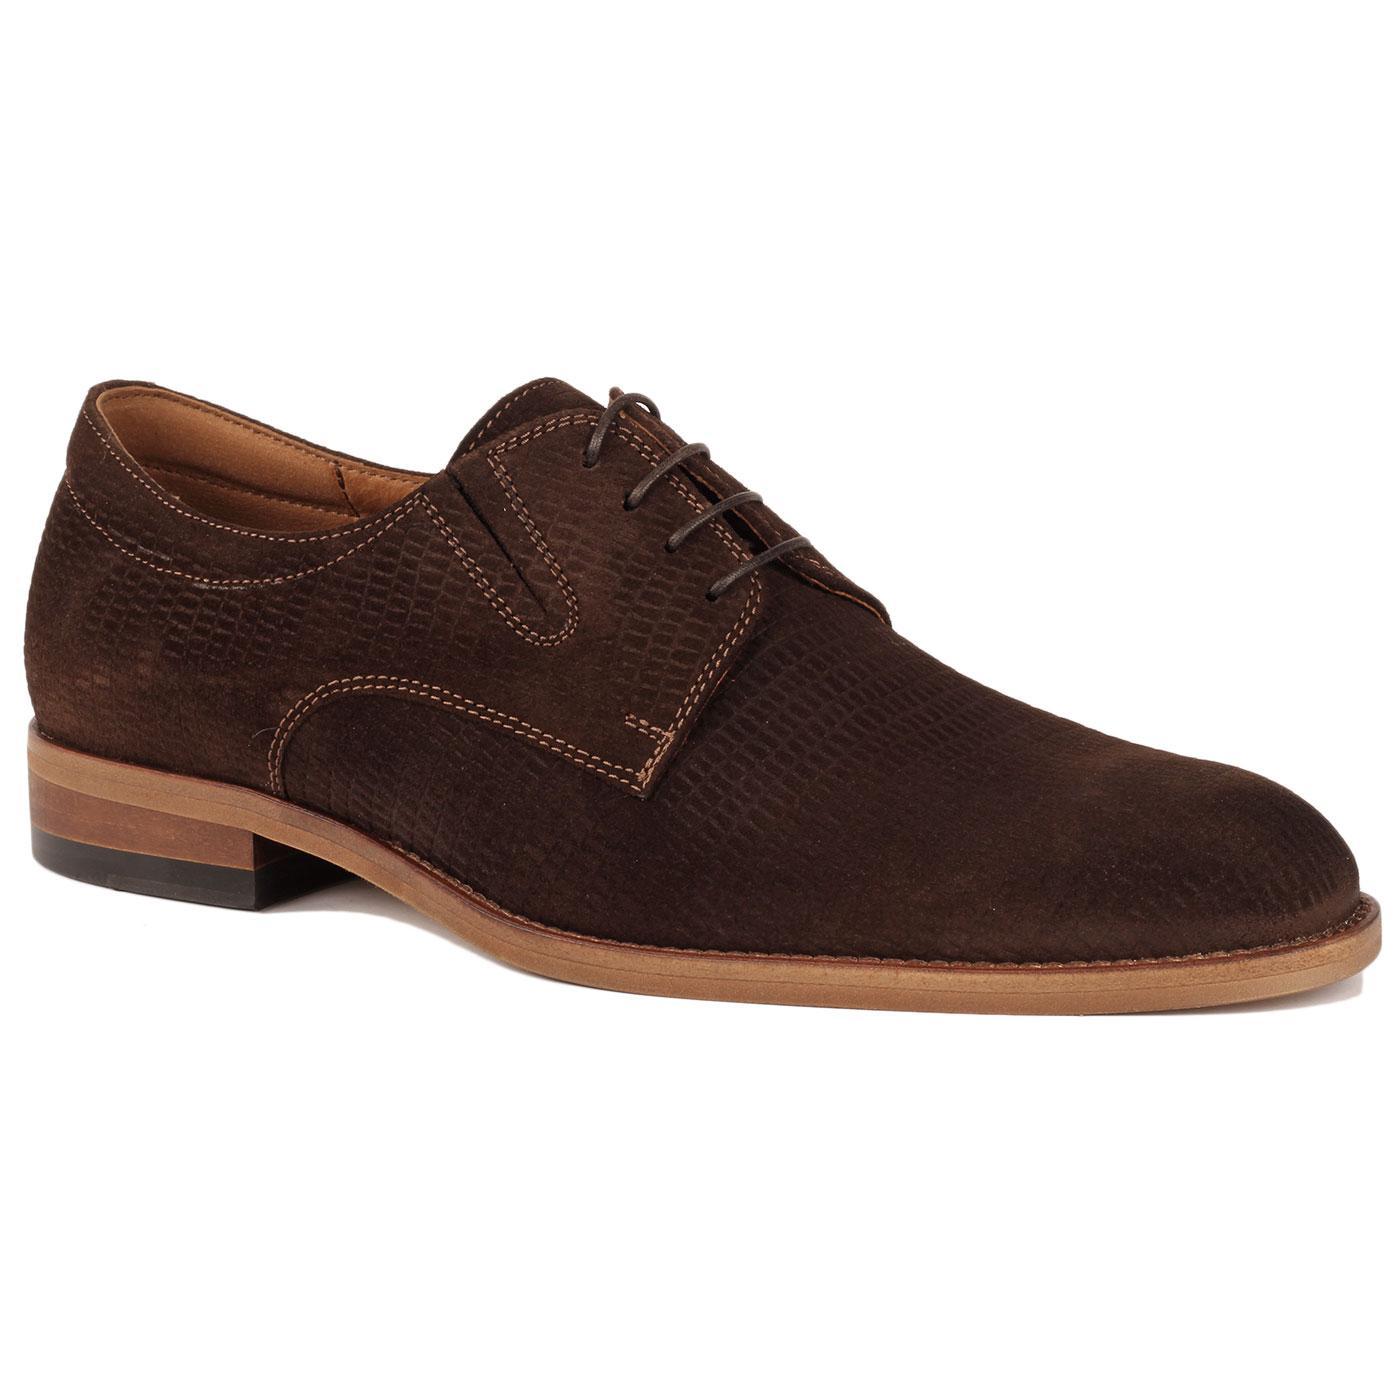 LACUZZO Men's Retro Croc Stamp Suede Shoes (Brown)